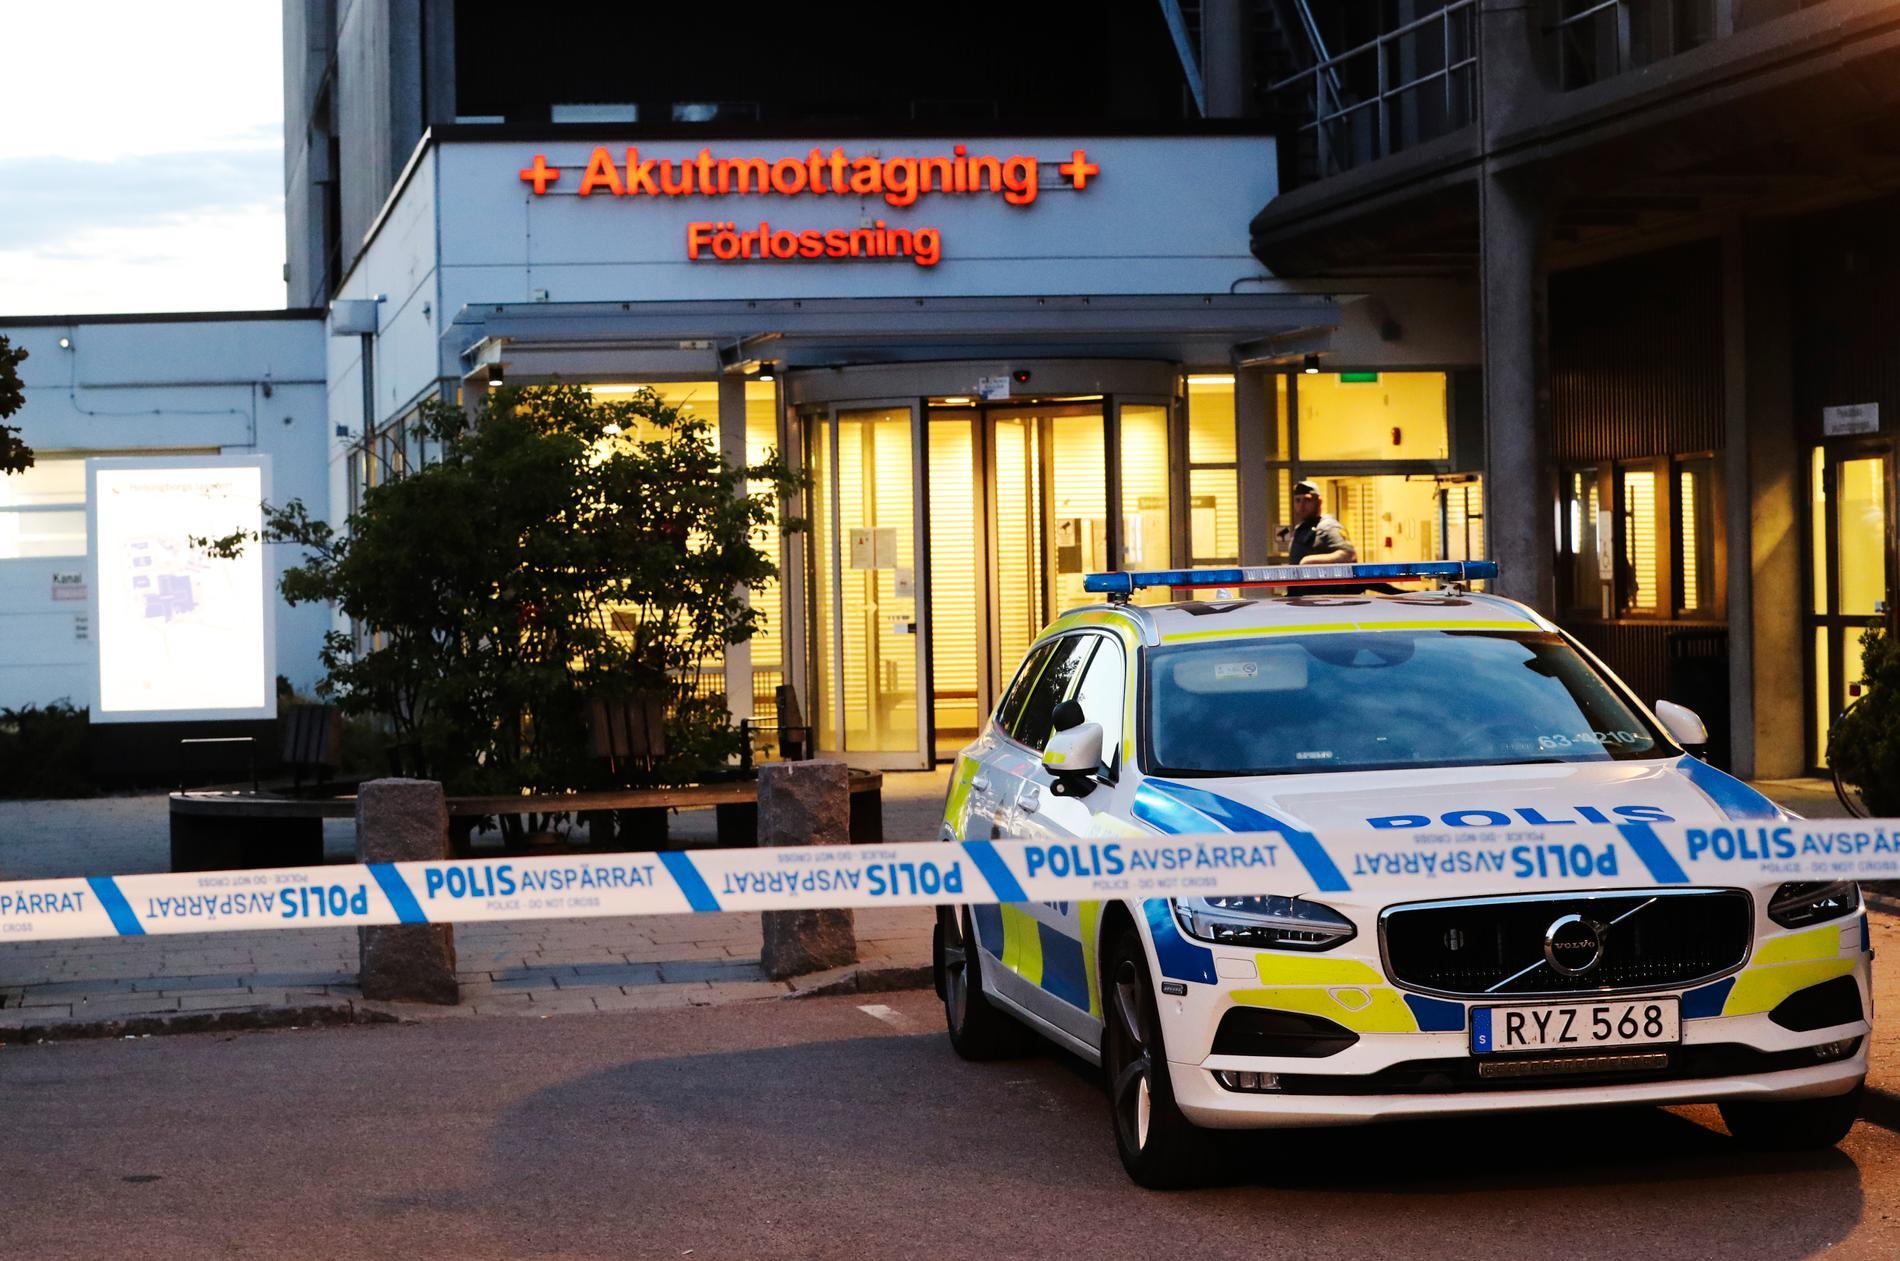 Sjukhuset i Helsingborg bevakas av flera polispatruller.